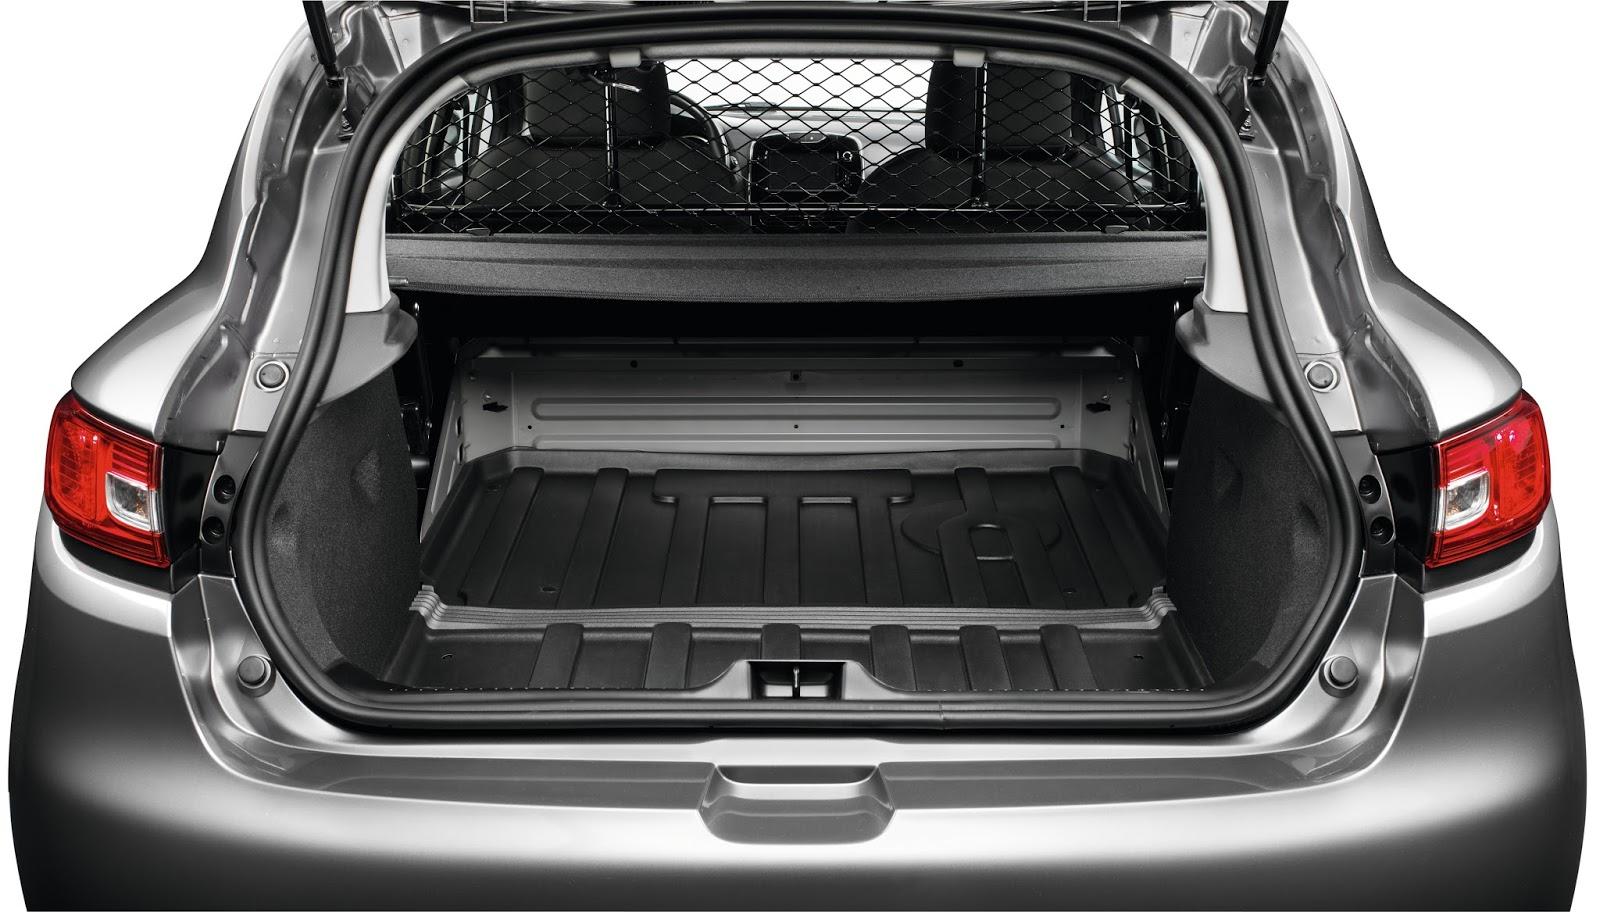 clio societe back Το επαγγελματικό Renault Clio Pro+ με νέο κινητήρα 1.5 dCi Euro6 και κατανάλωση 3,1lt/100km Hatchback, Renault, Renault Clio, Renault Clio Pro+, Επαγγελματικά